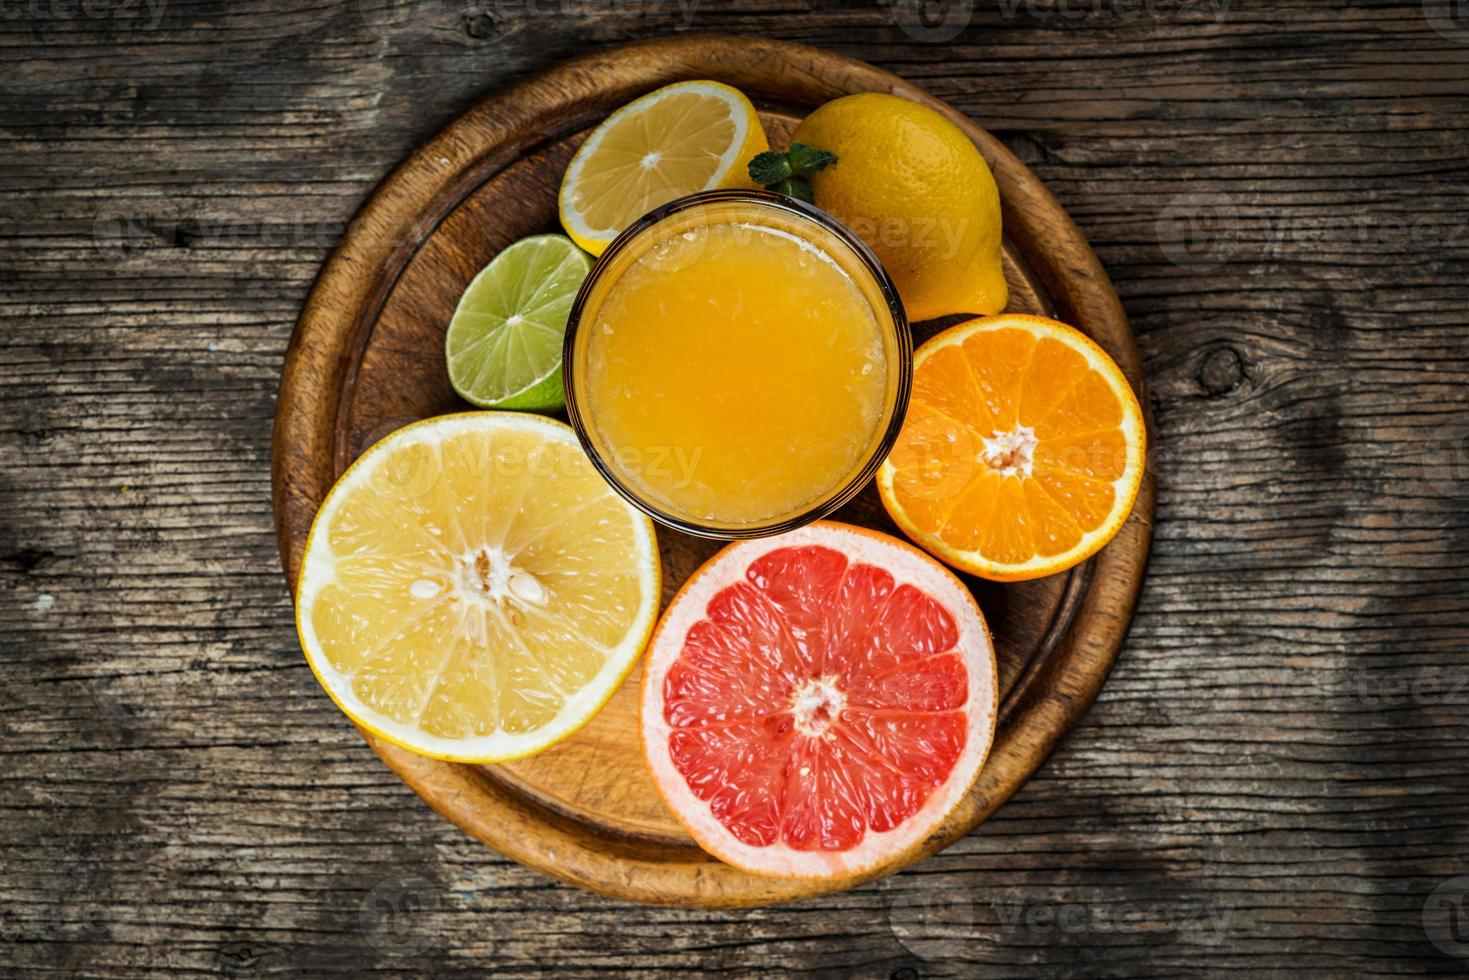 Citrus juice and fruits photo